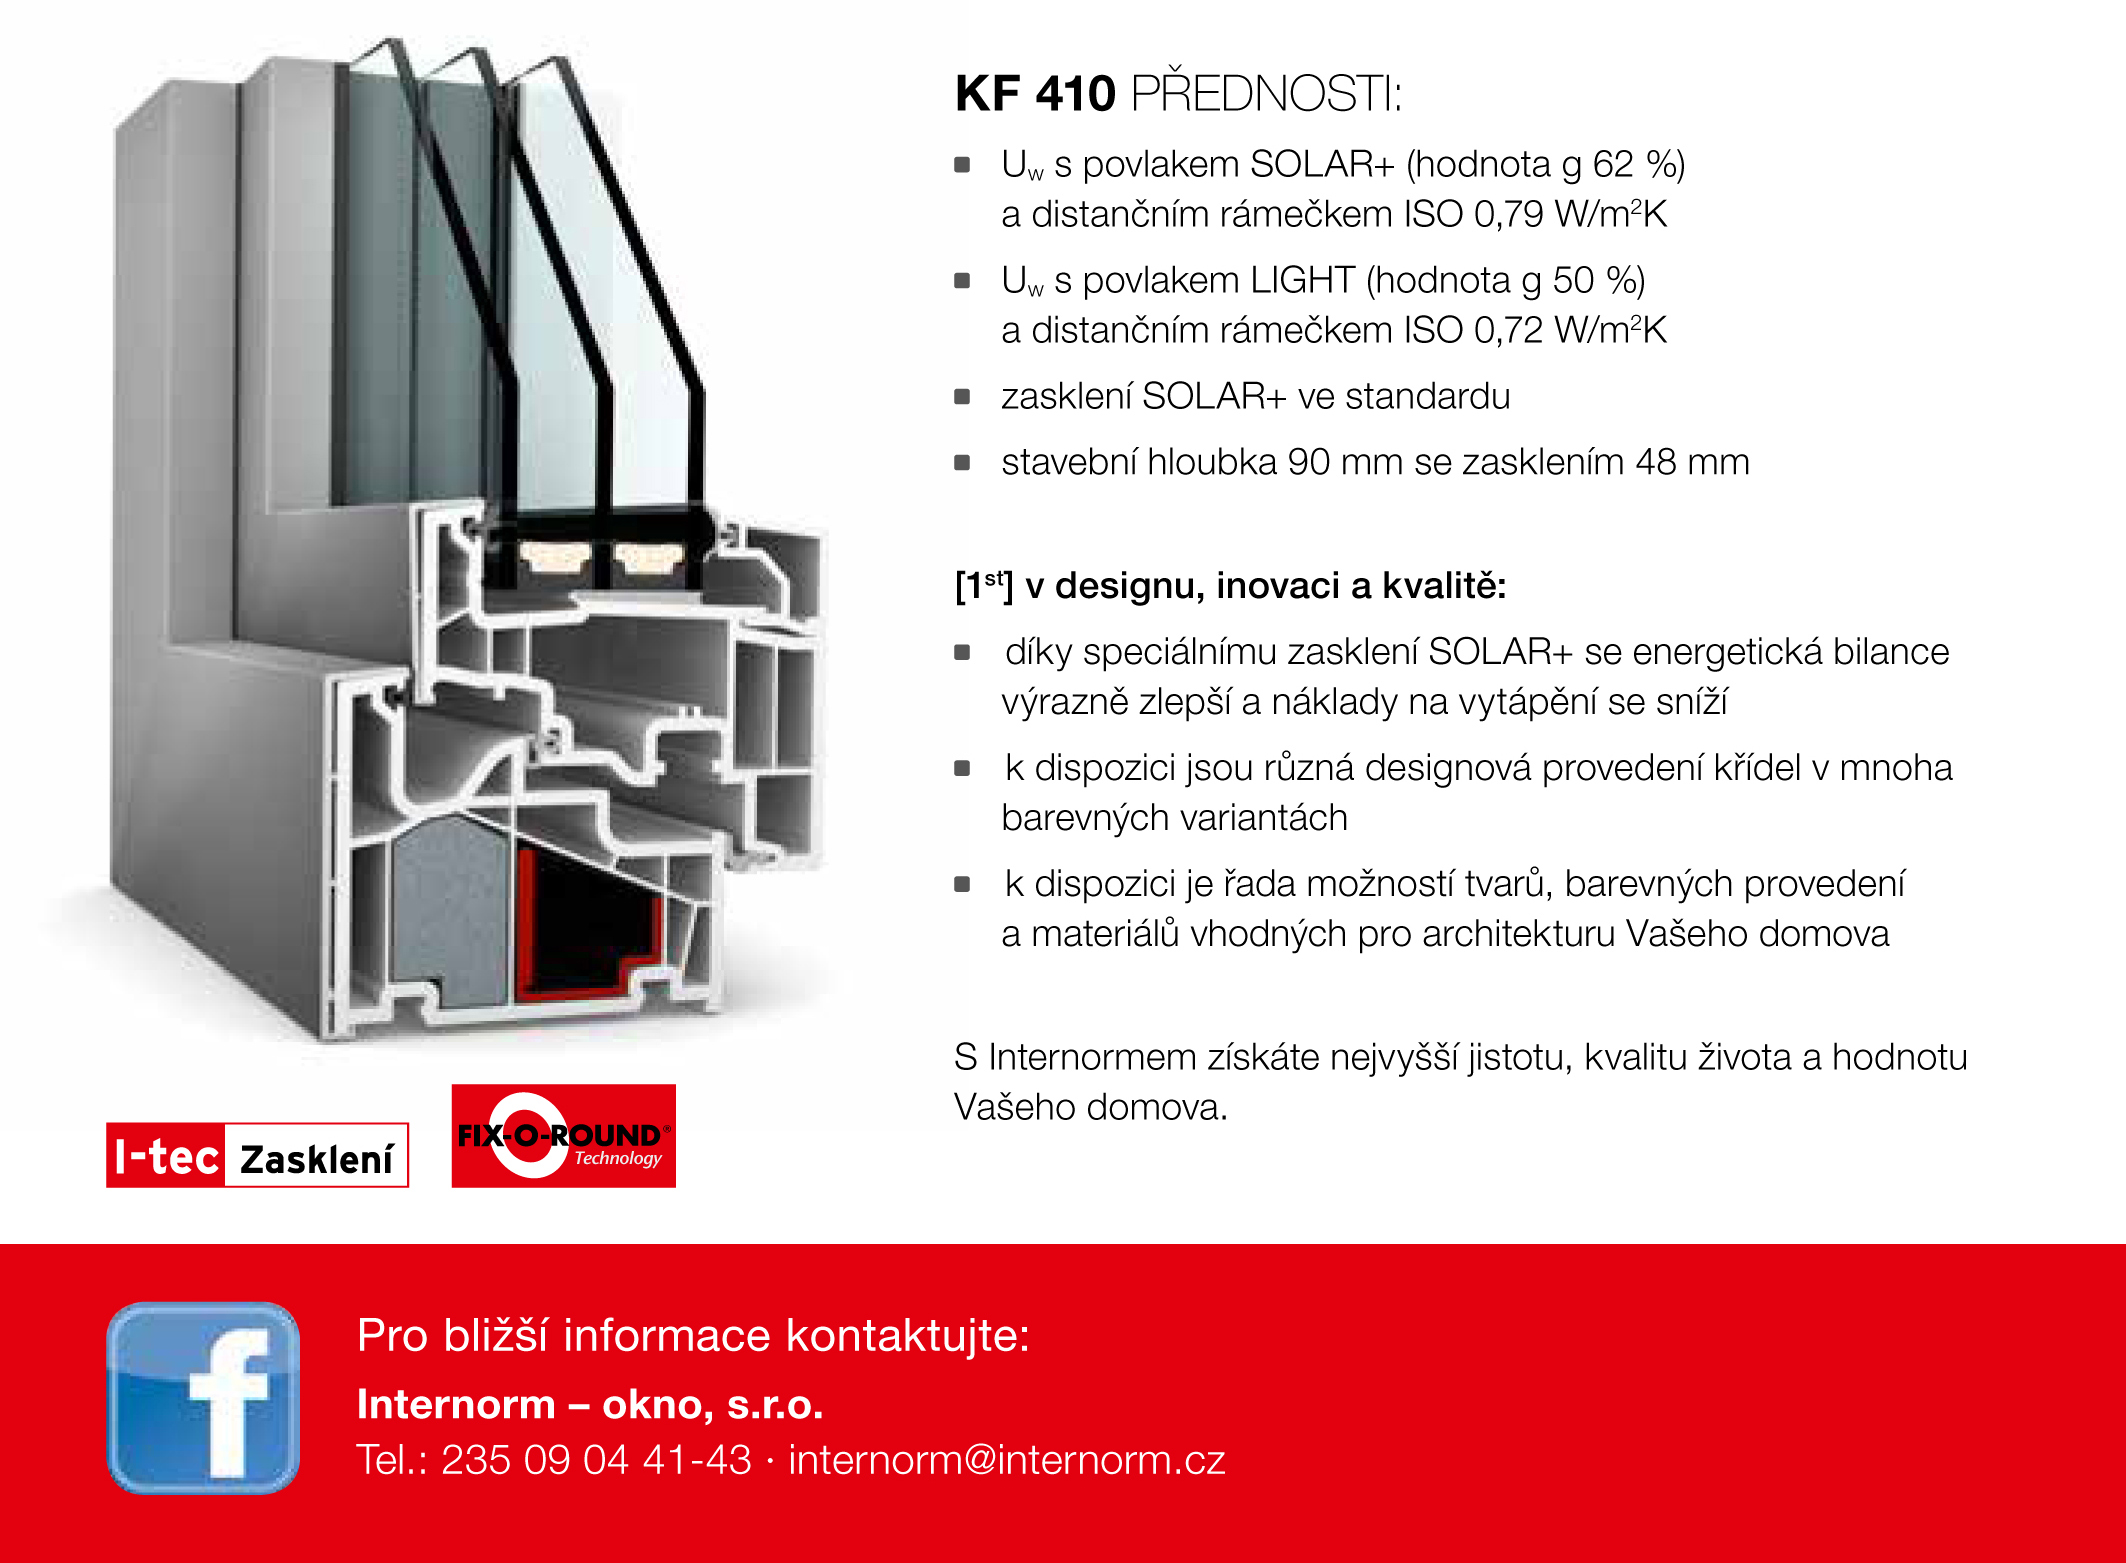 okno kf 410 spole nosti internorm nyn za ak n cenu. Black Bedroom Furniture Sets. Home Design Ideas